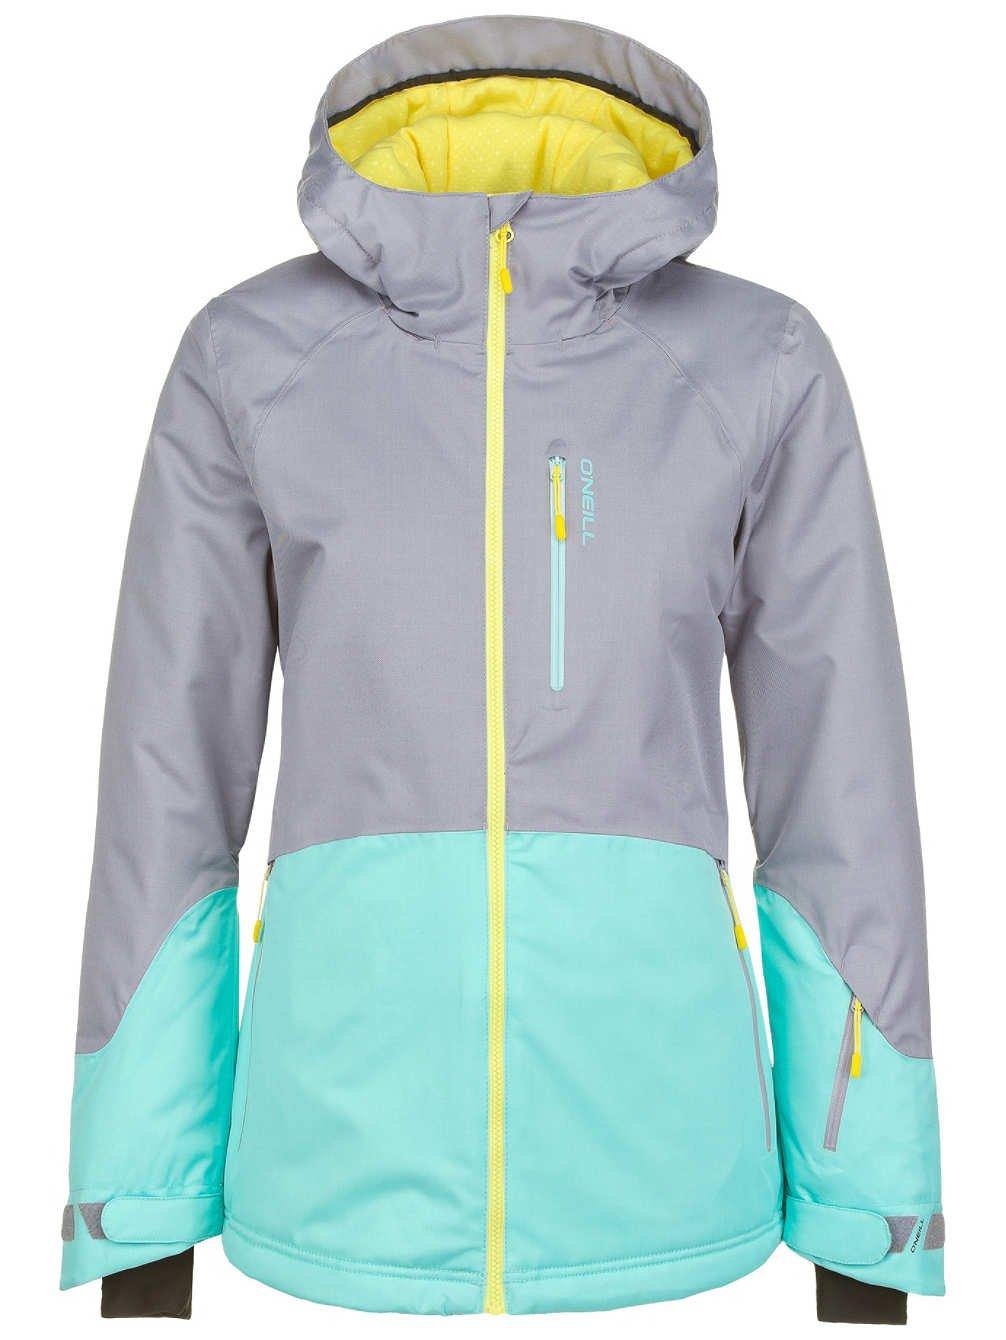 Damen Snowboard Jacke O'Neill Karma Jacket günstig kaufen